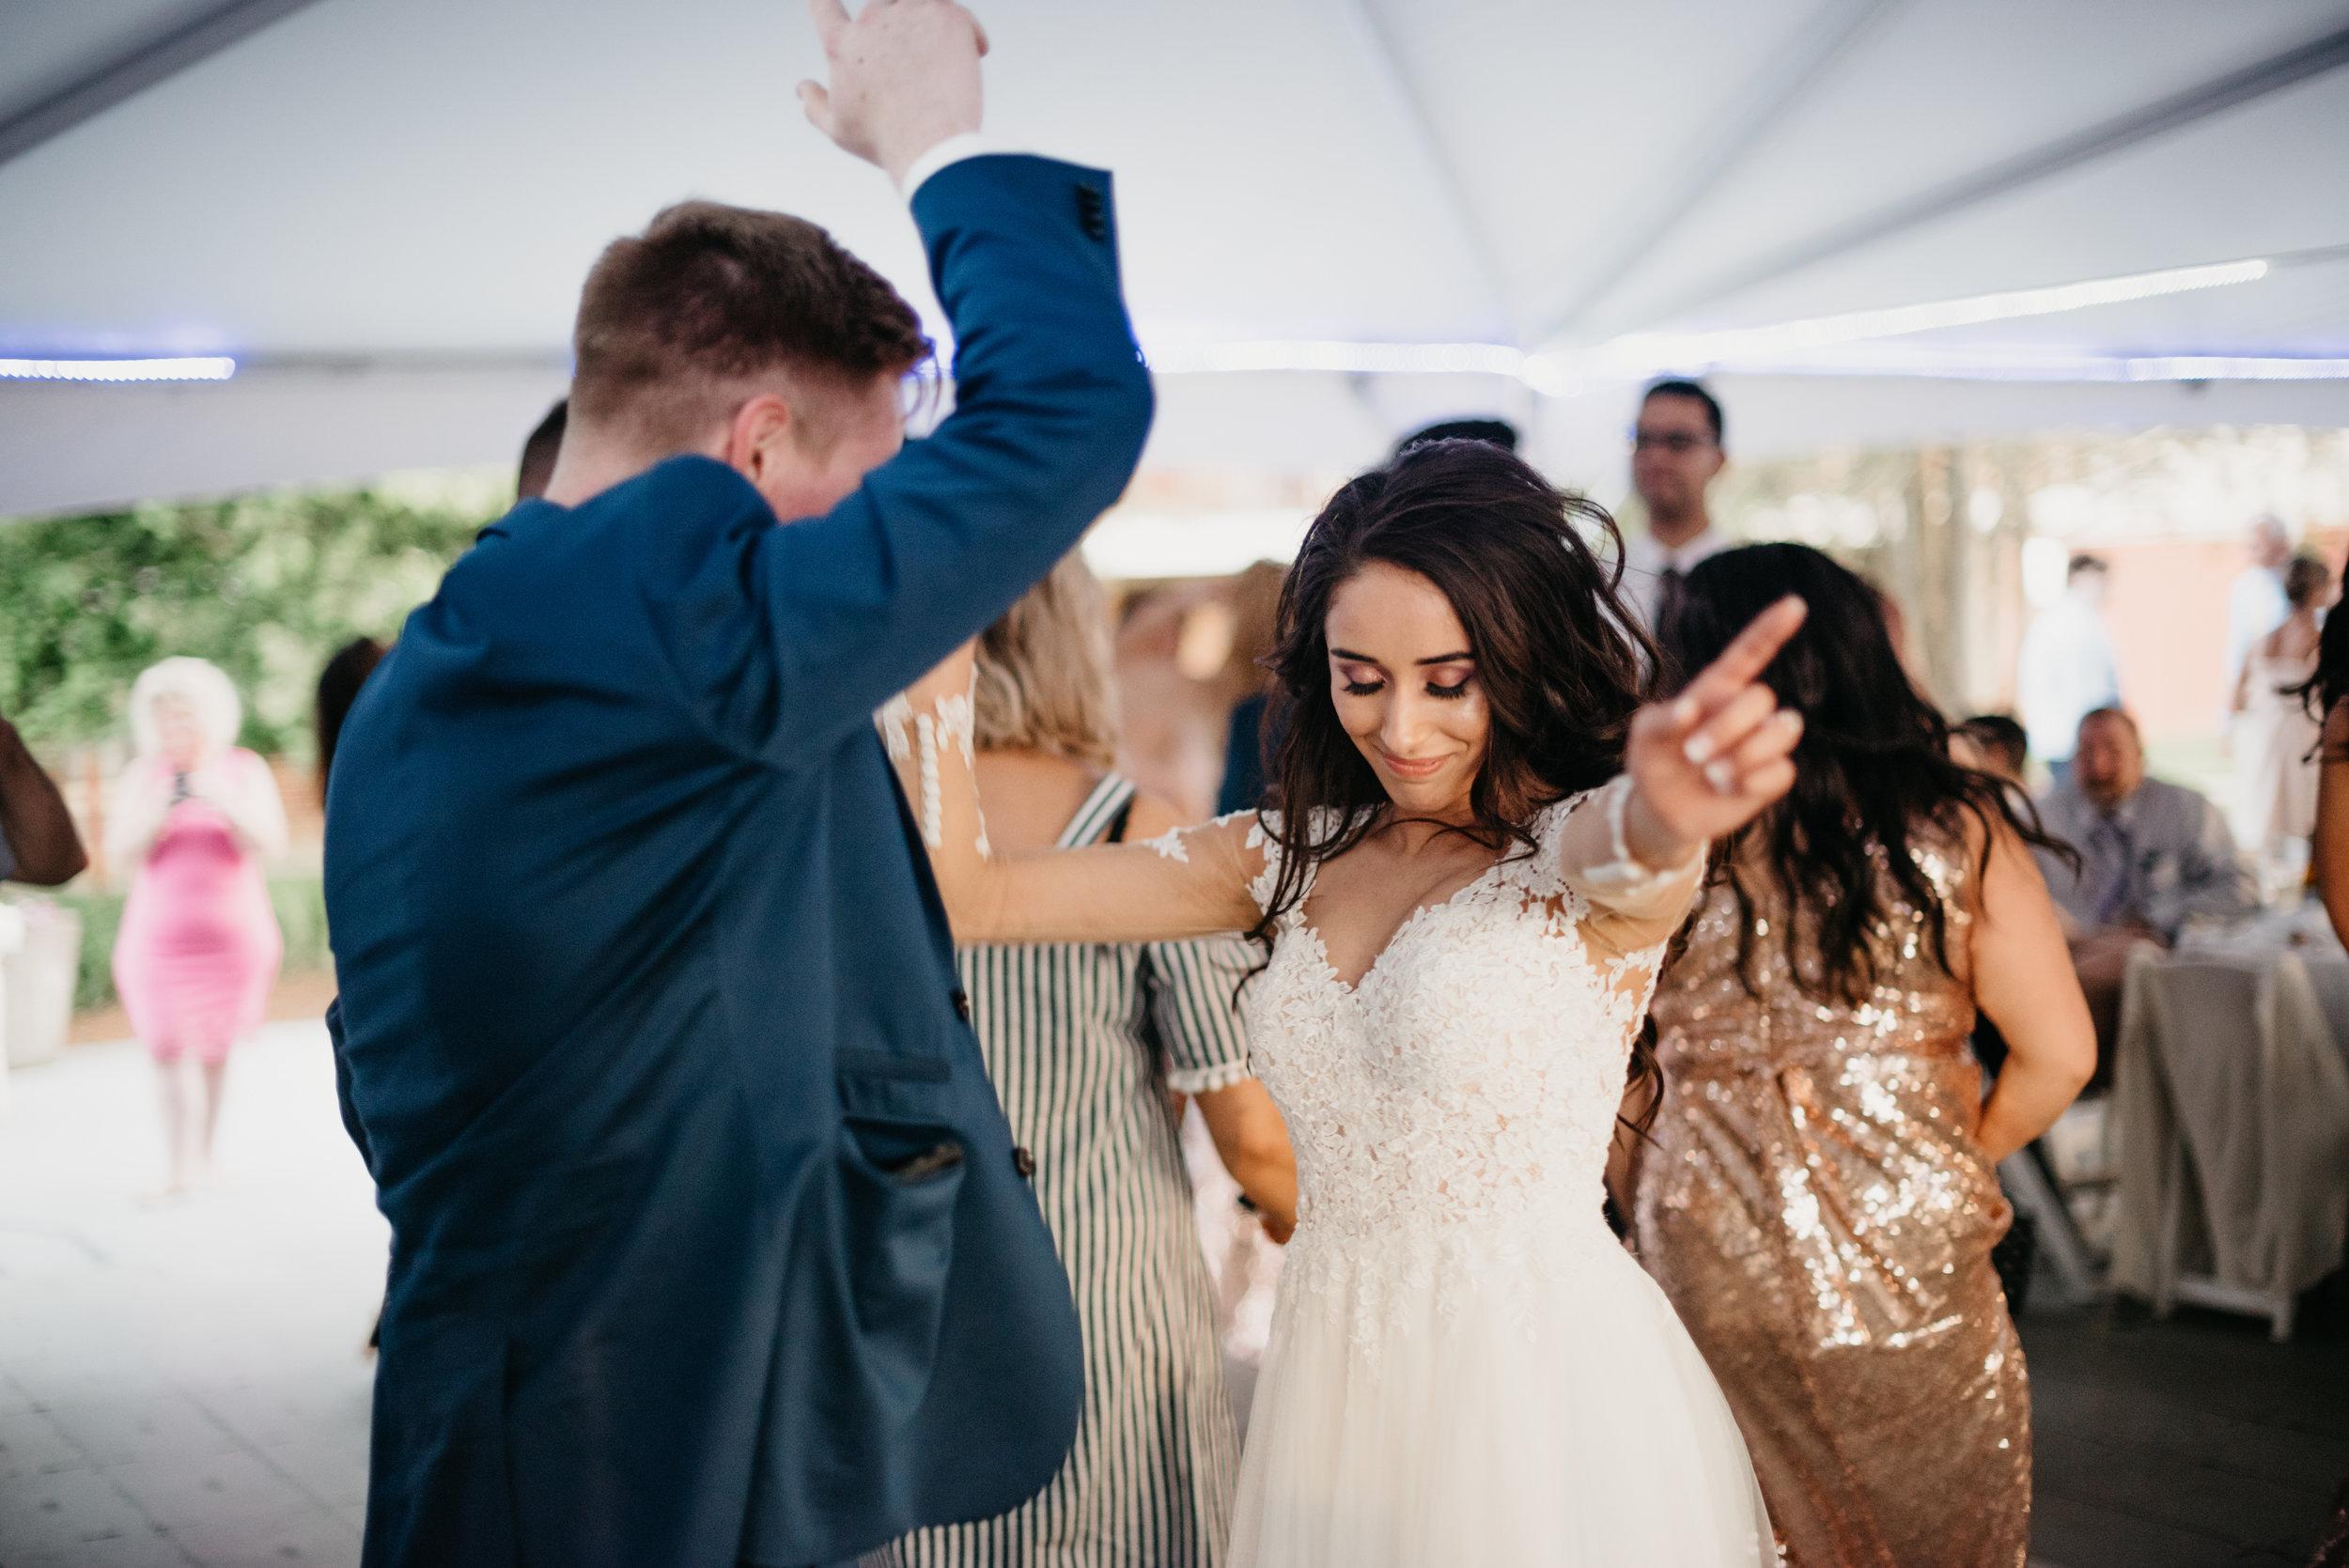 Barch-Massachusetts-Lakeside Tent Wedding-Western Massachusetts Wedding Photographer-03619.jpg